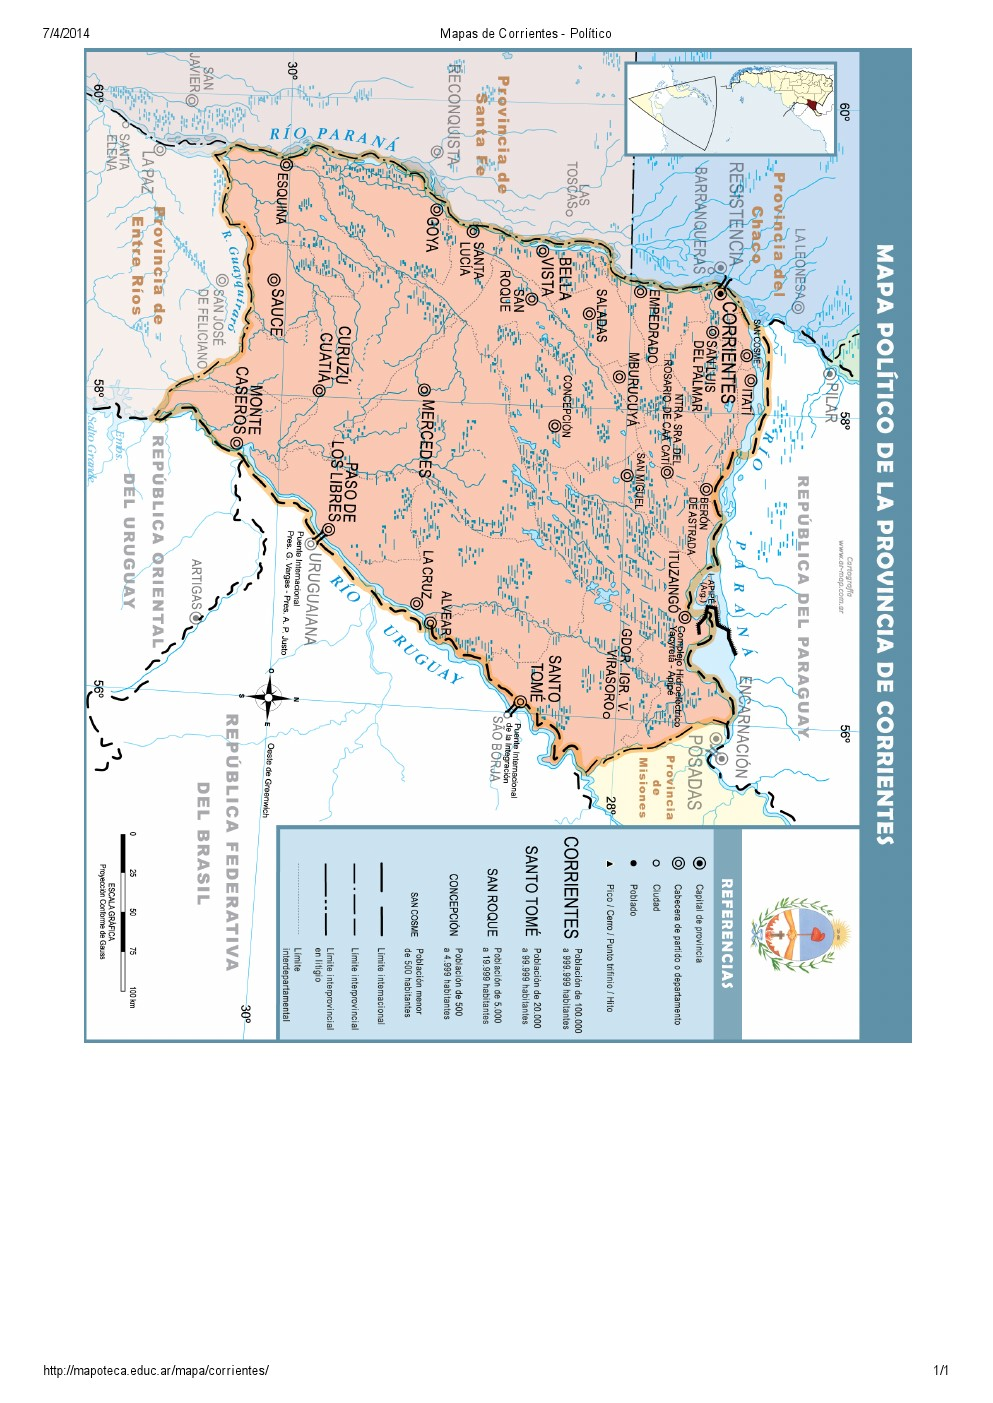 Mapa de capitales de Corrientes. Mapoteca de Educ.ar